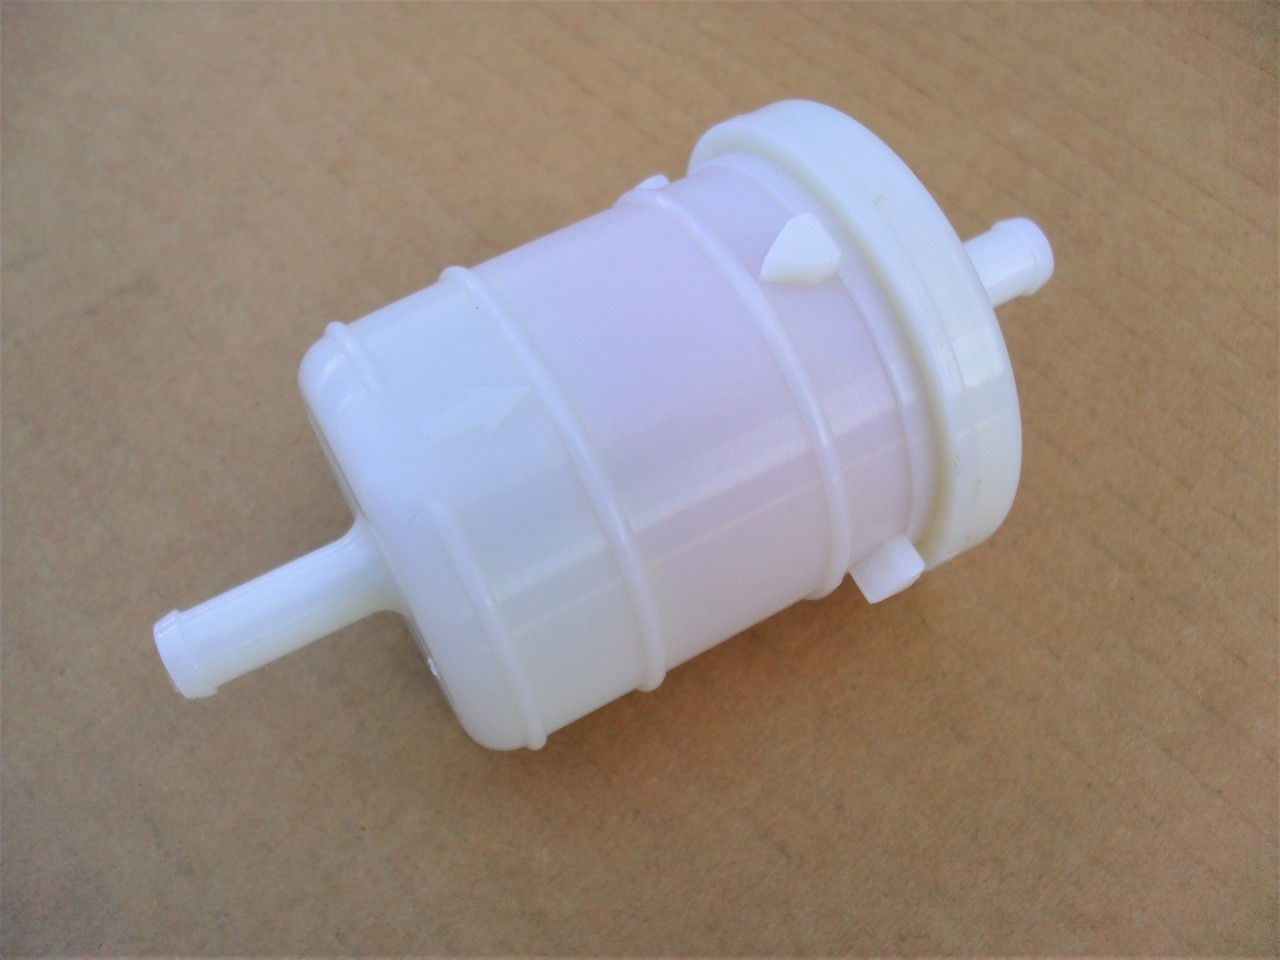 hight resolution of diesel fuel filter for kubota 1258143010 1258143012 1269143010 1335143010 12581 43010